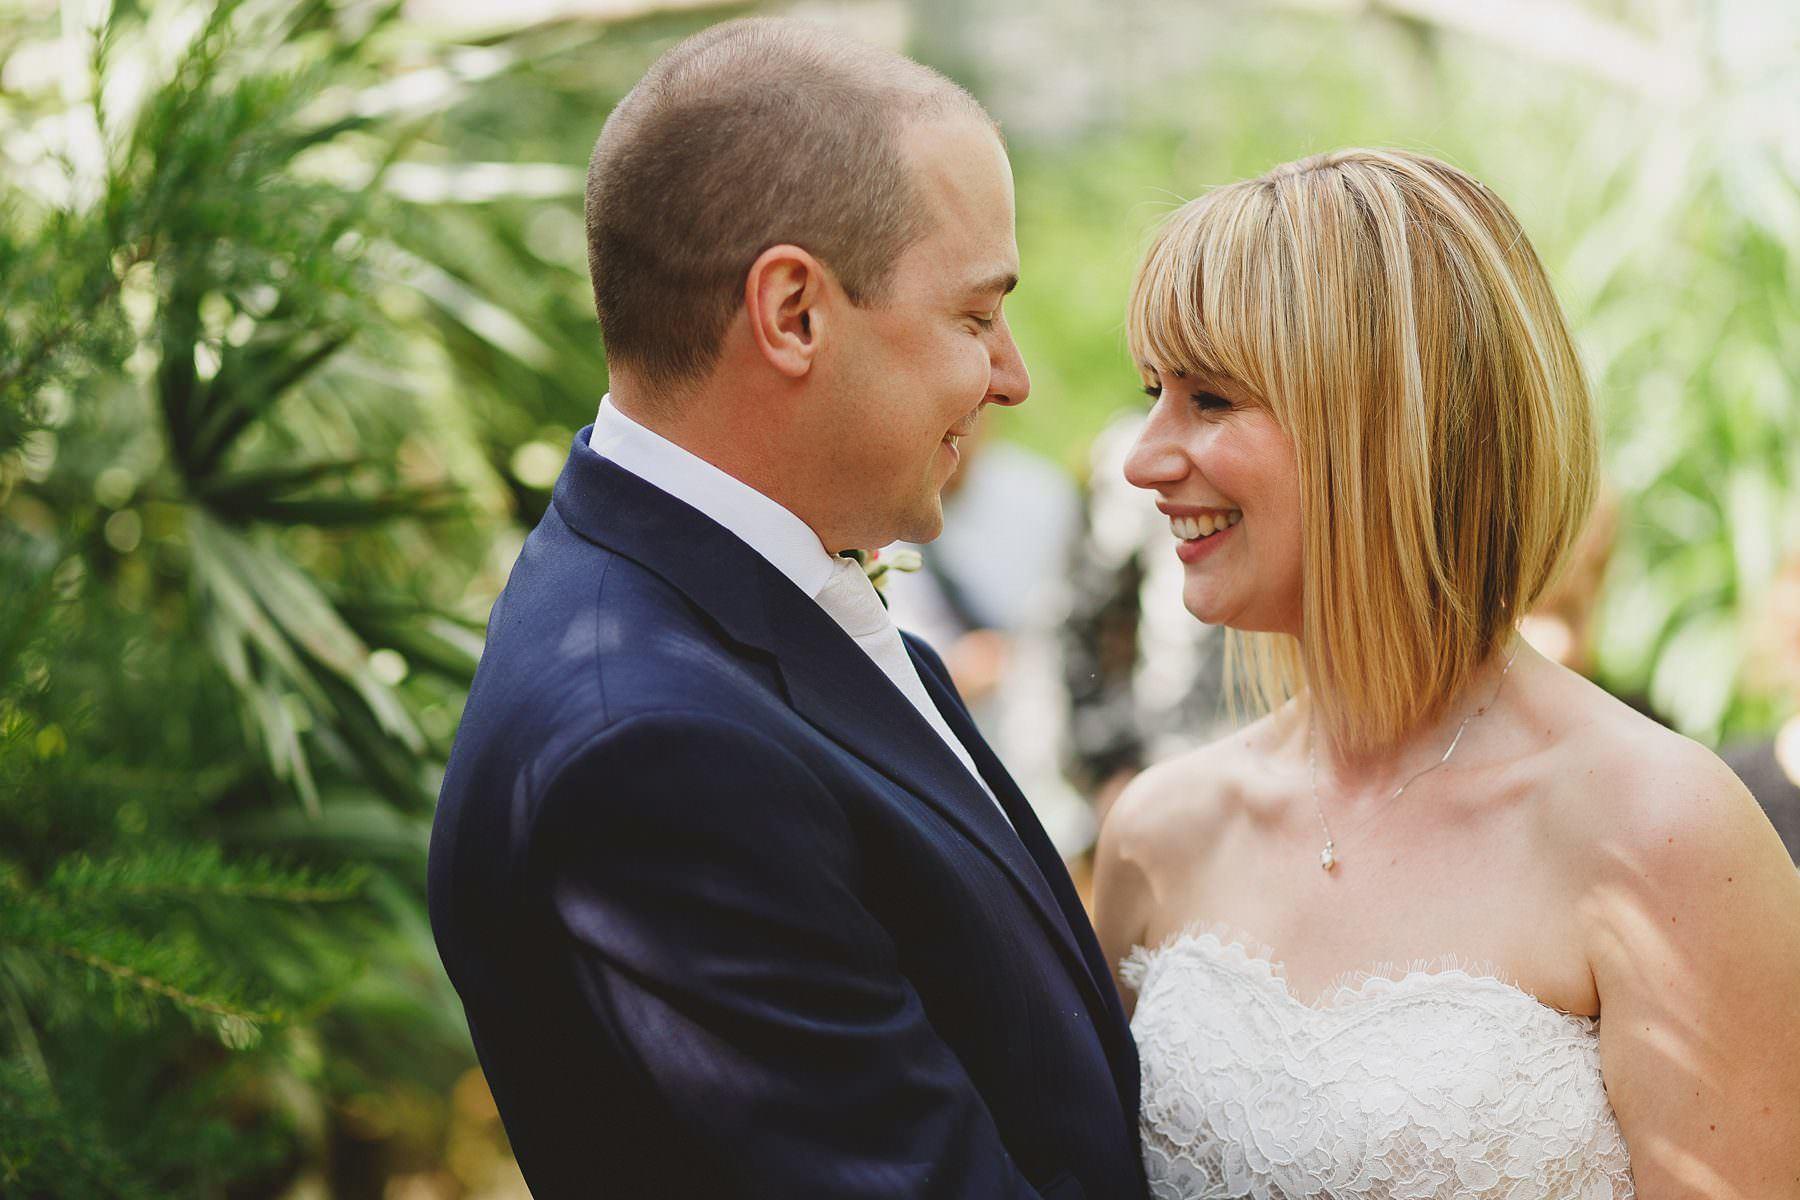 weddings-at-bristol-zoo-012